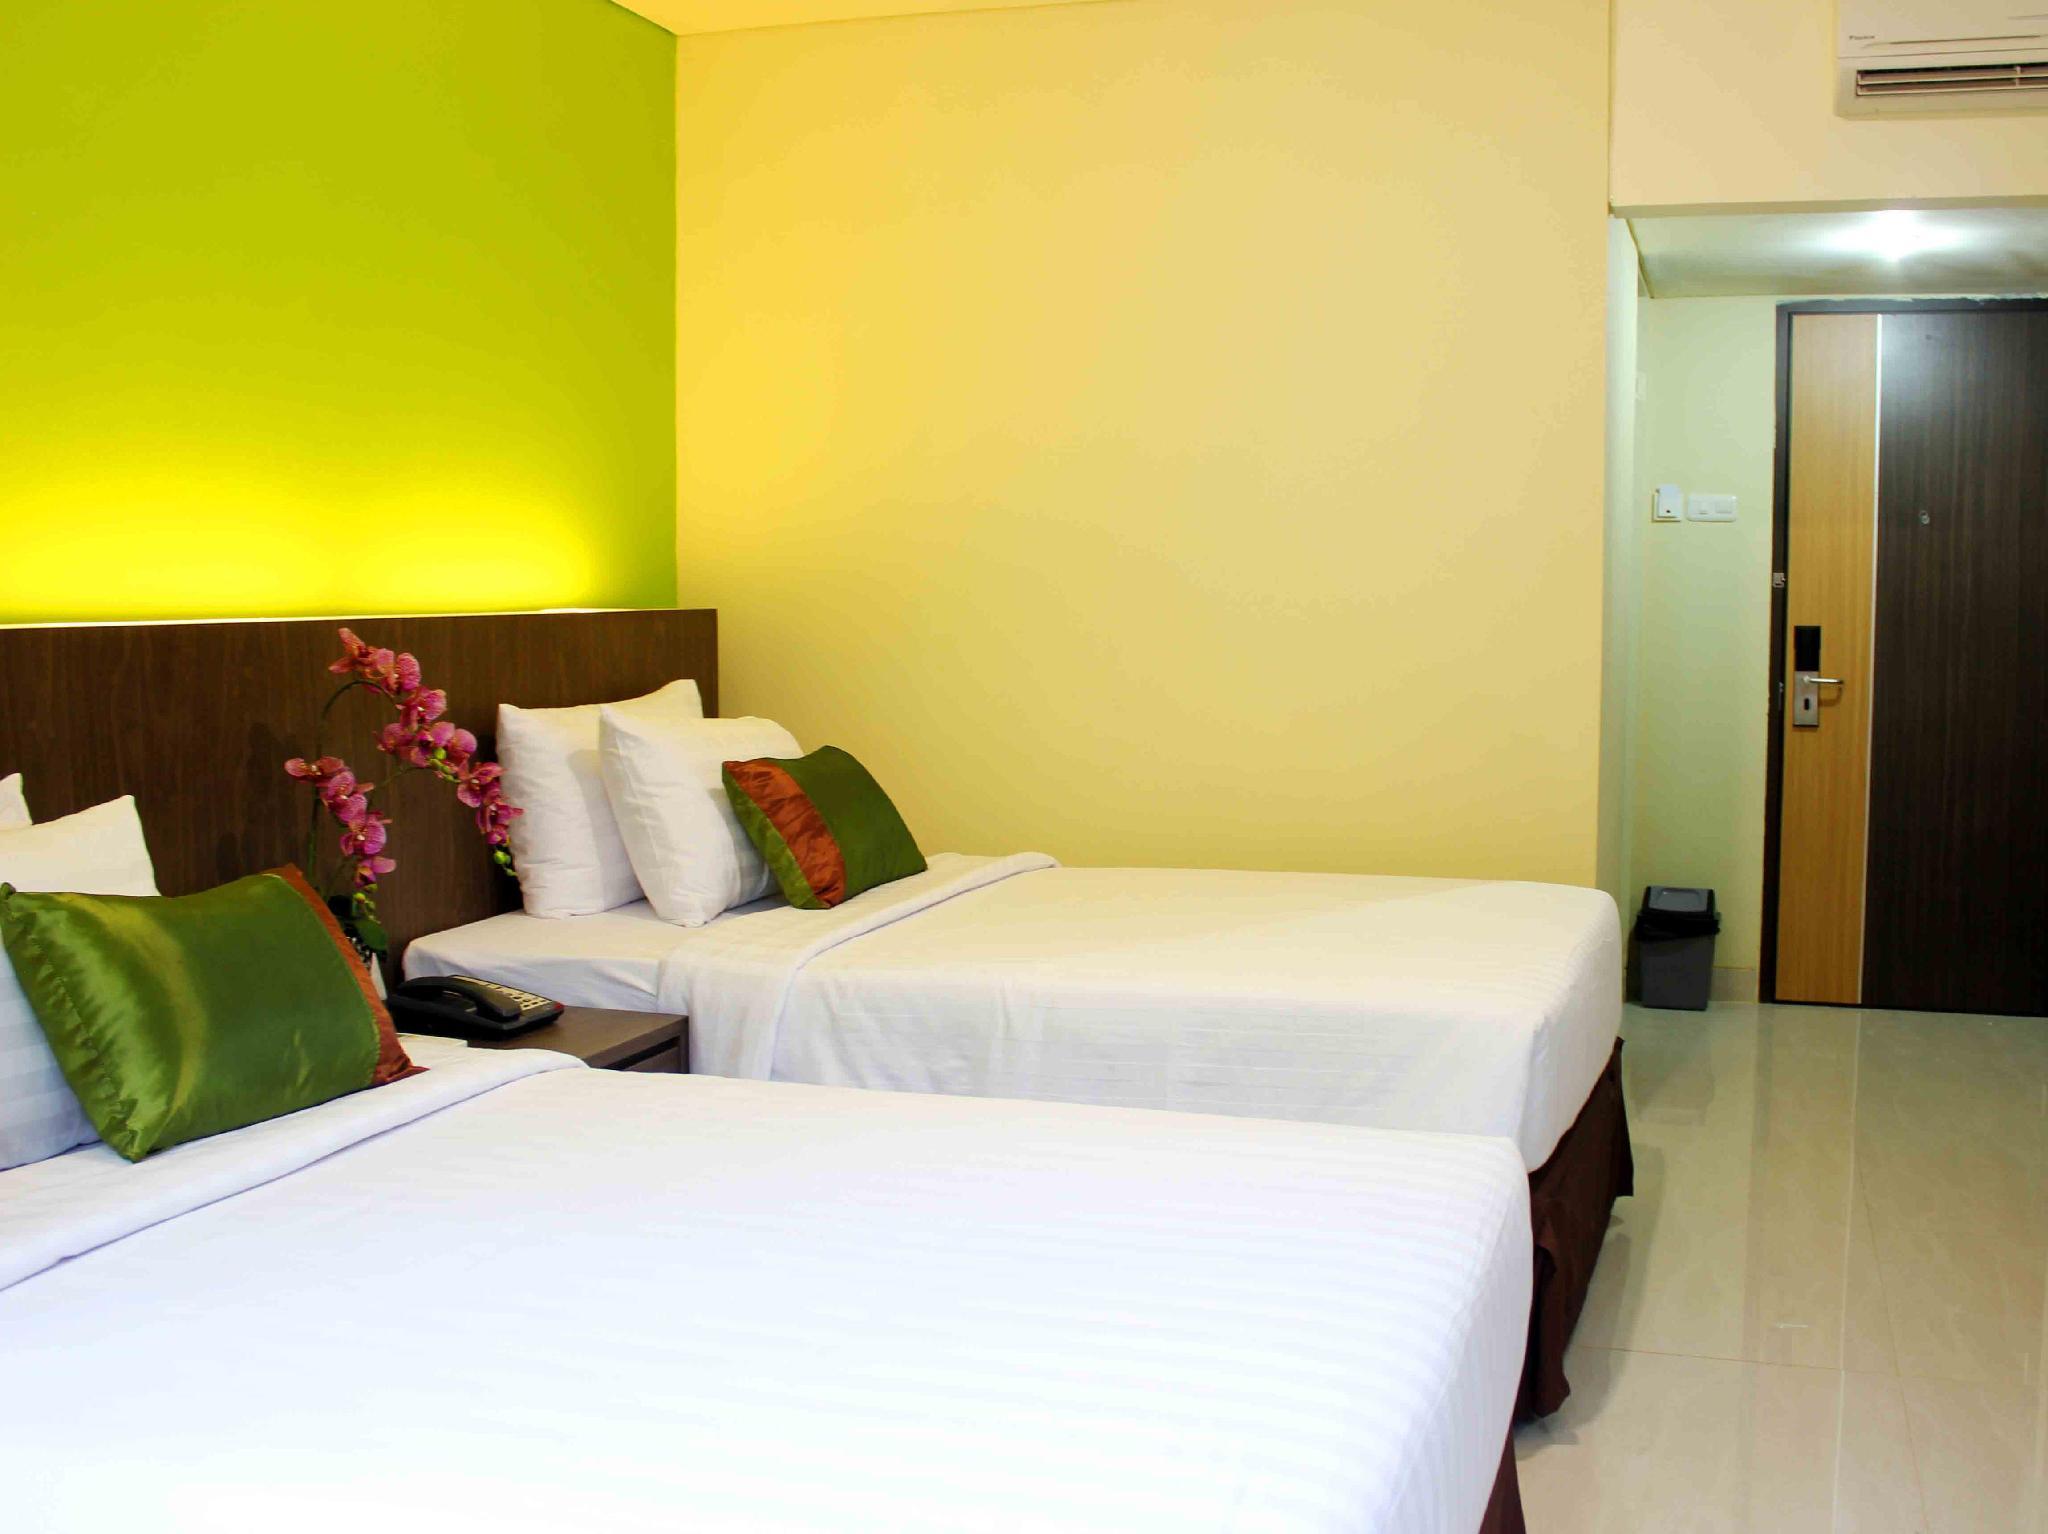 Hotel Bali De Anyer Hotel and Restaurant - Jalan Raya Labuan KM 10 - Banten